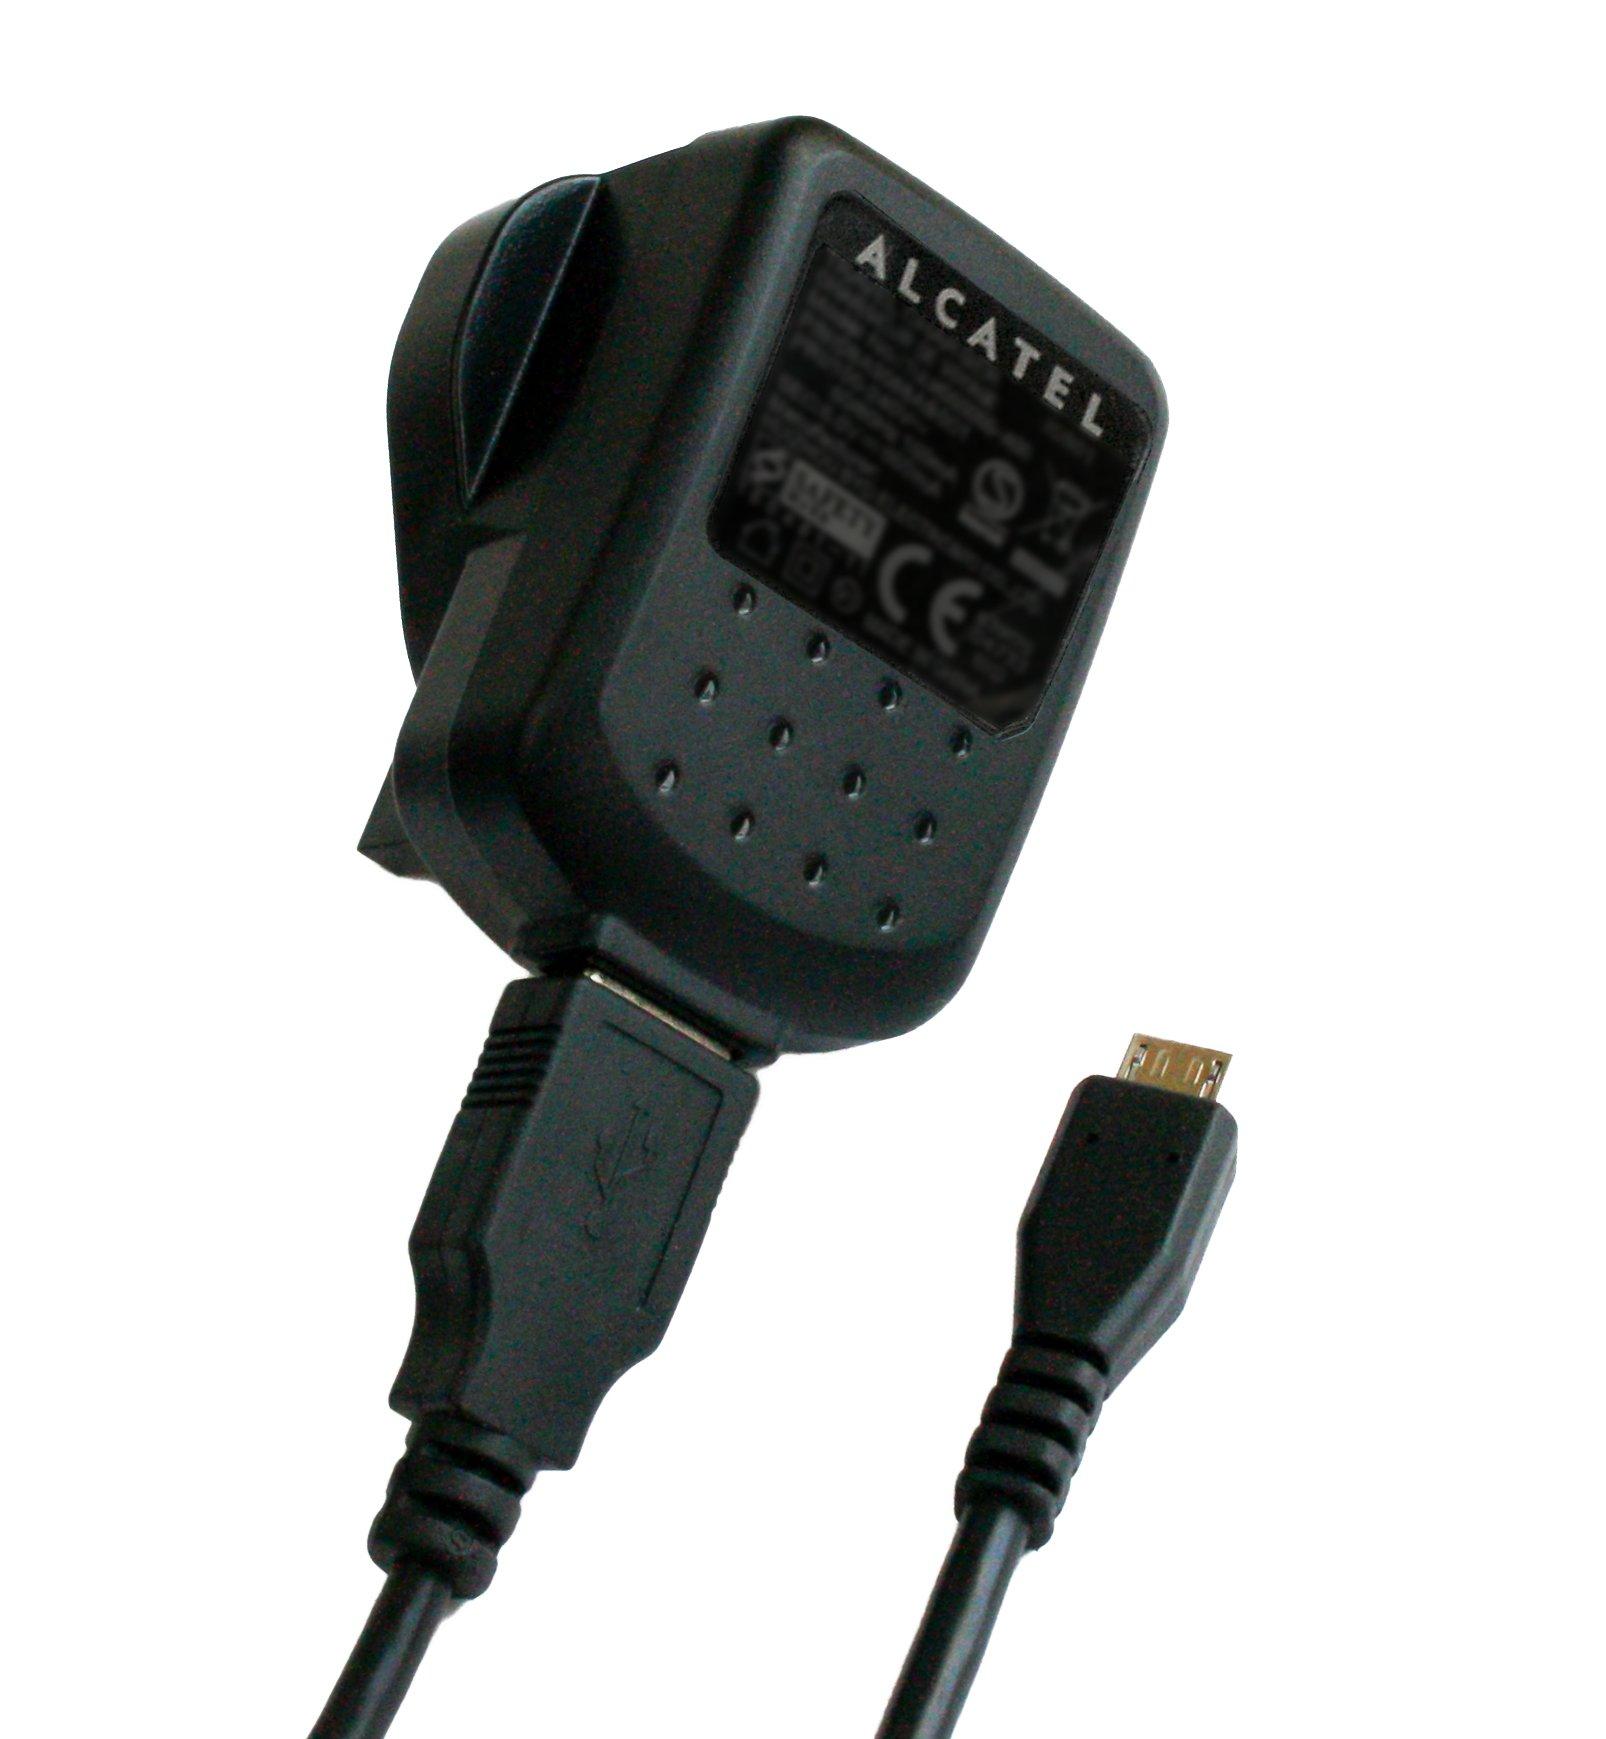 Genuine Alcatel Black 550 mAh 3 Pin Micro USB Mains Charger Suitable for Alcatel Pixi 2 , Pop D1 , Pop D3 , Pixi 3 ( 3.5 ) and Pixi 3 ( 4.0 )